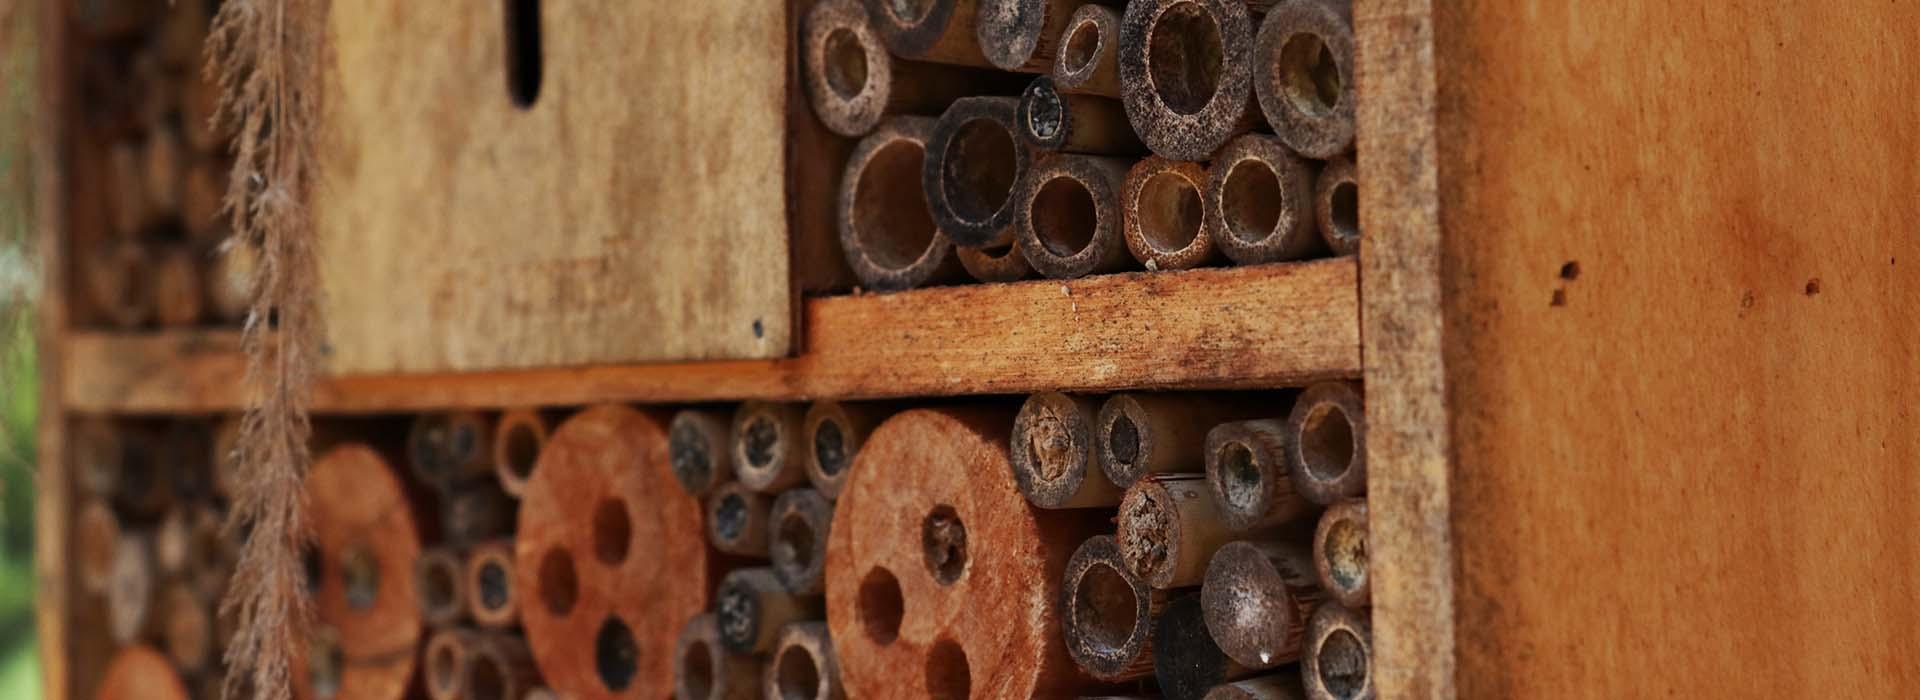 Insektenhotel ausstatten